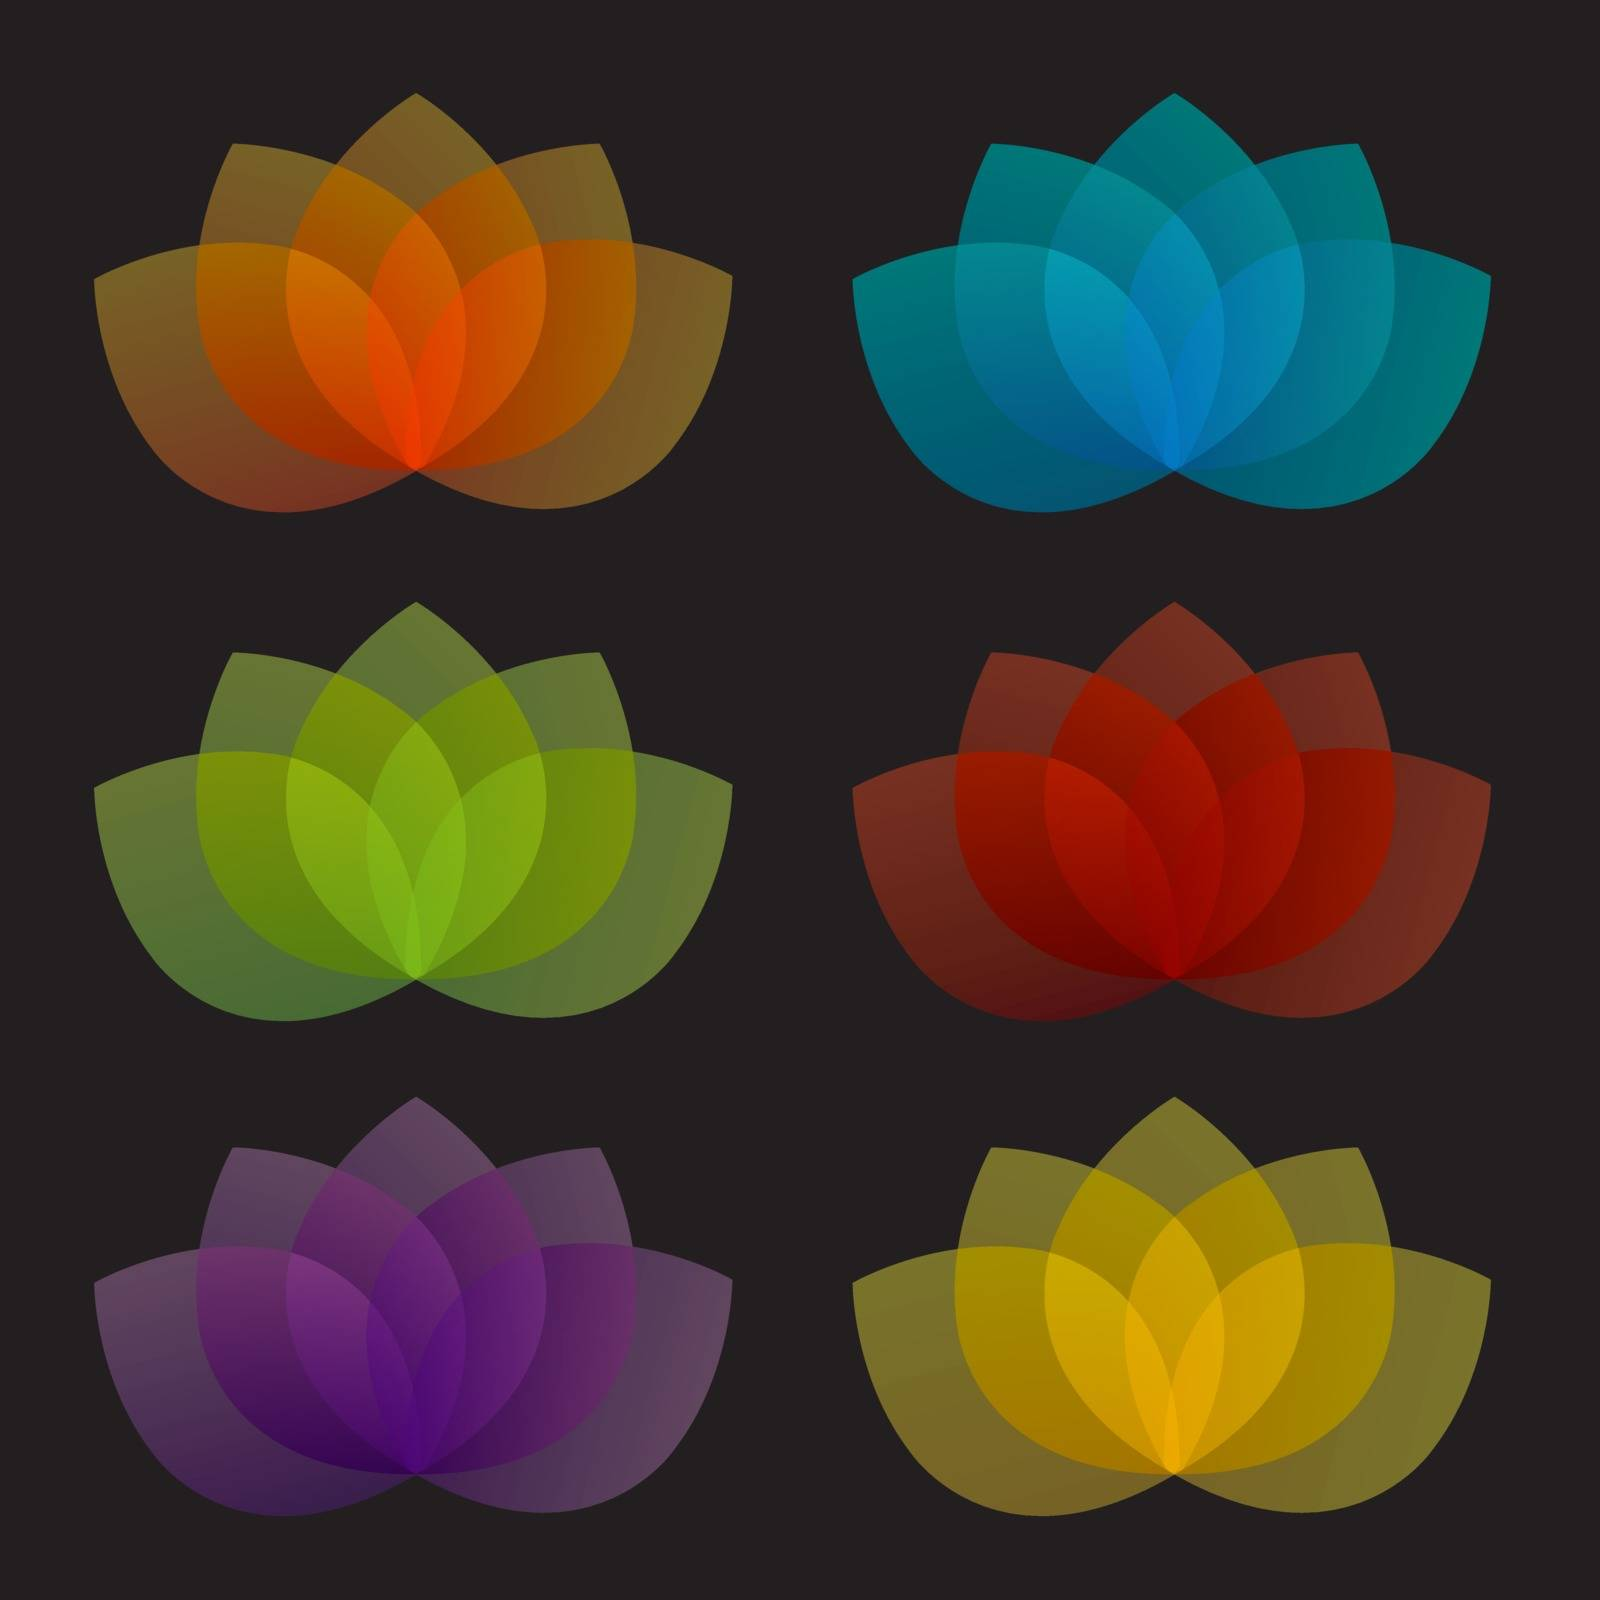 Graceful lotus with 5 petals